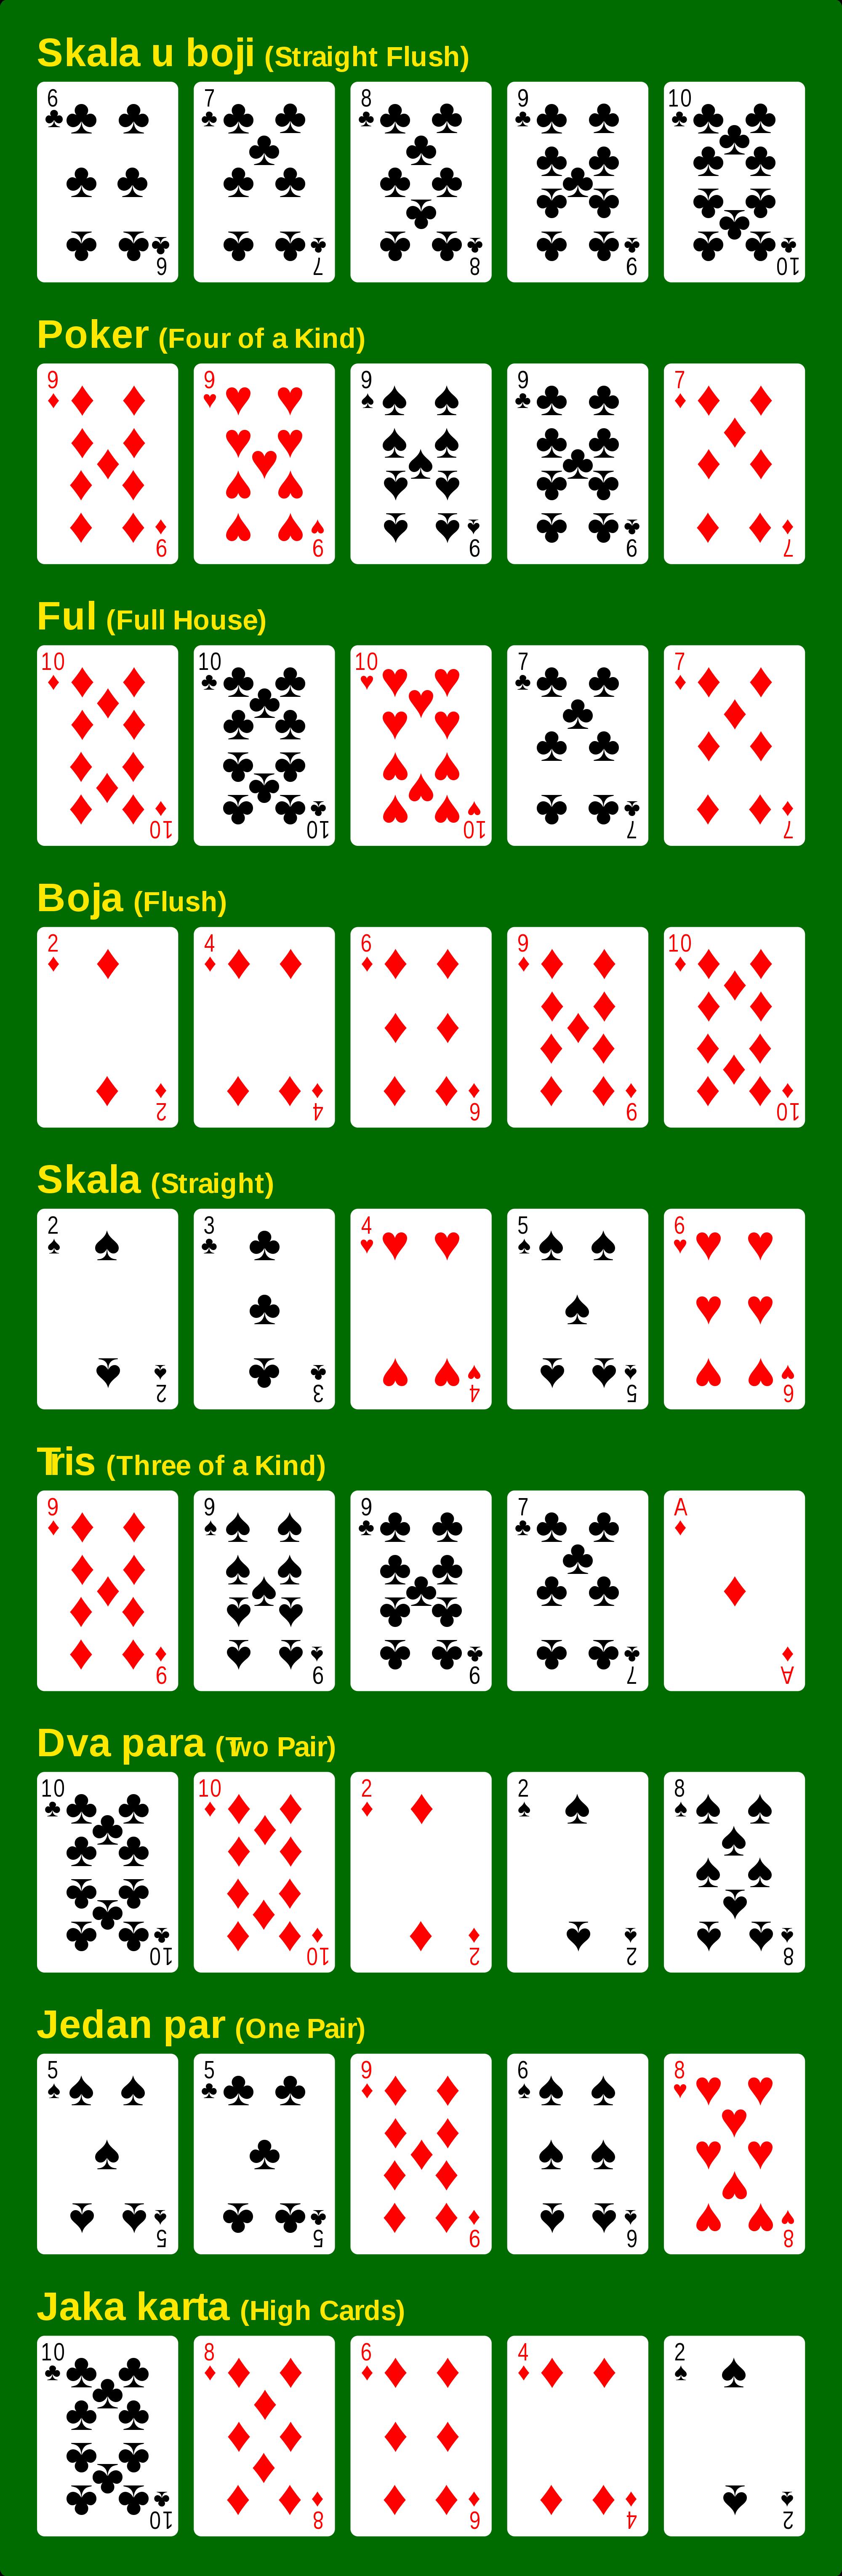 Teksas Holdem Poker Jacina Karata Abcen